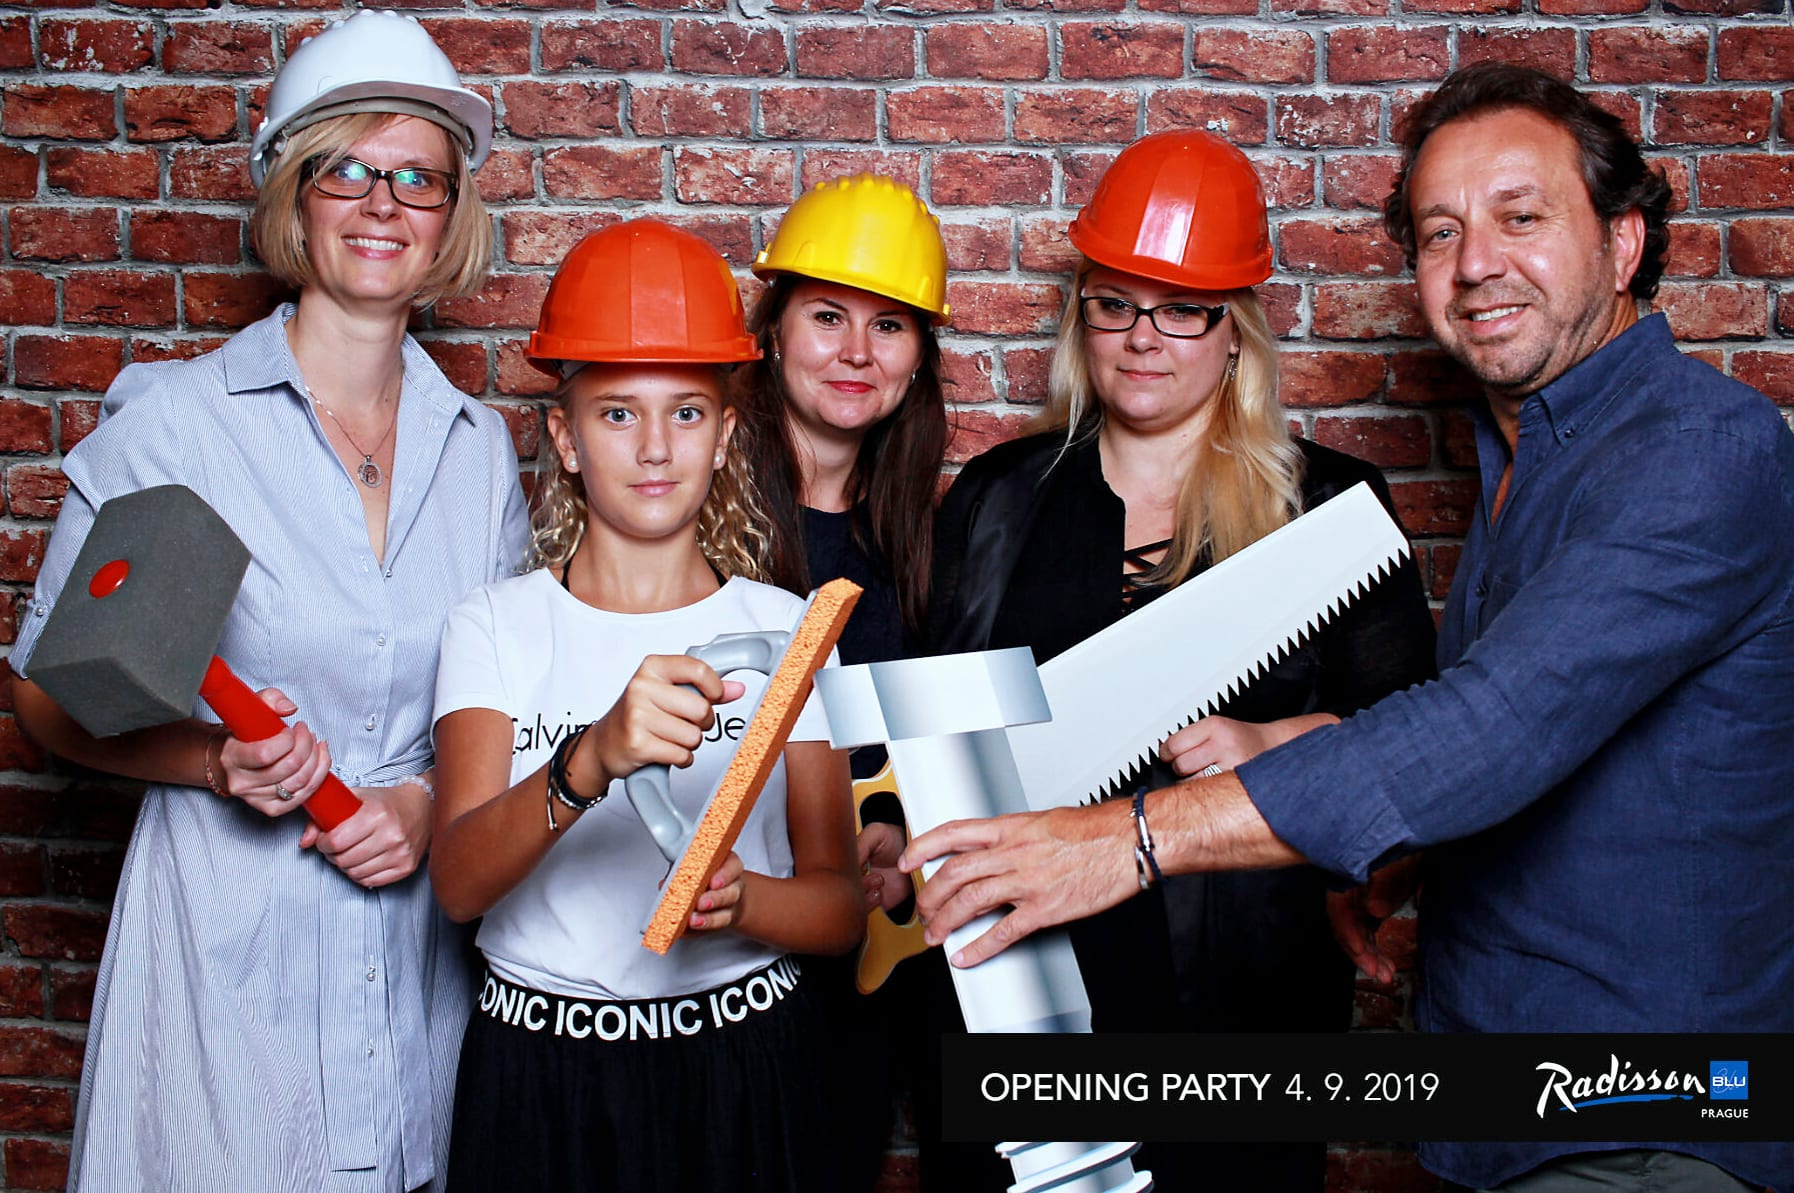 fotokoutek-ostrava-praha-radisson-4-9-2019-647509